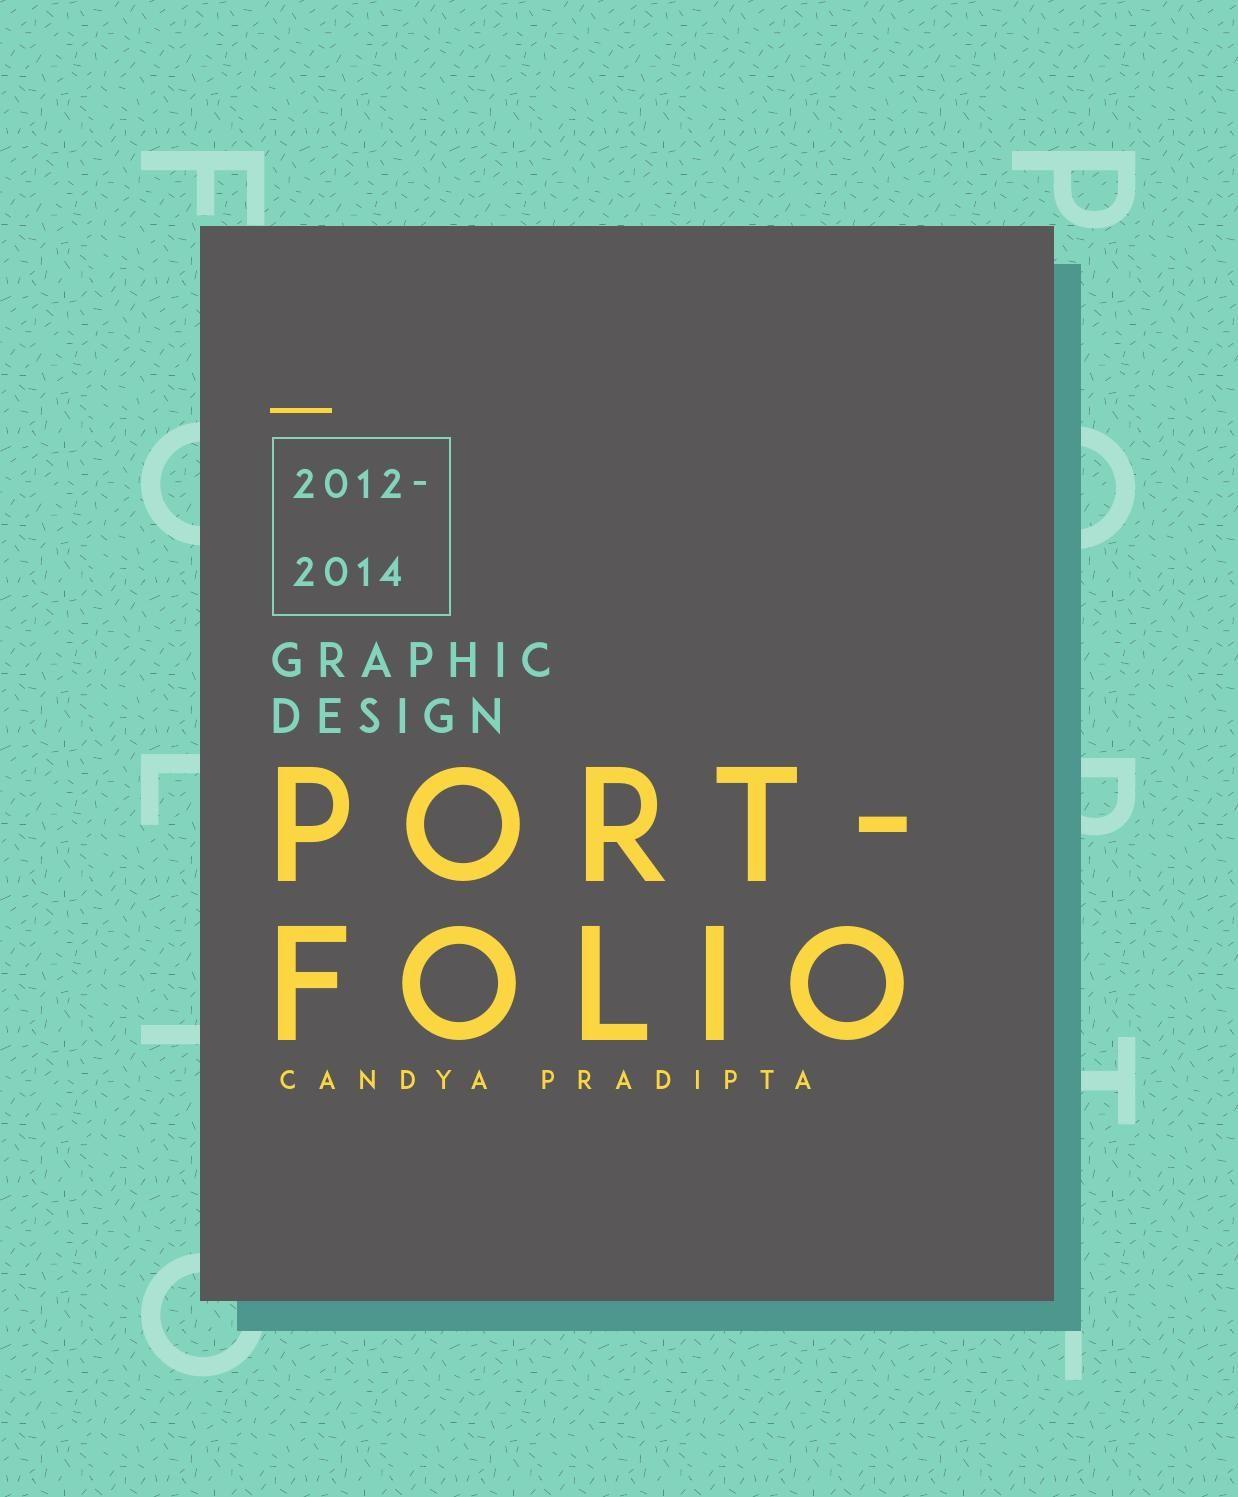 2012-2014 Portfolio / Candya Pradipta | Layouts, Portfolio design ...